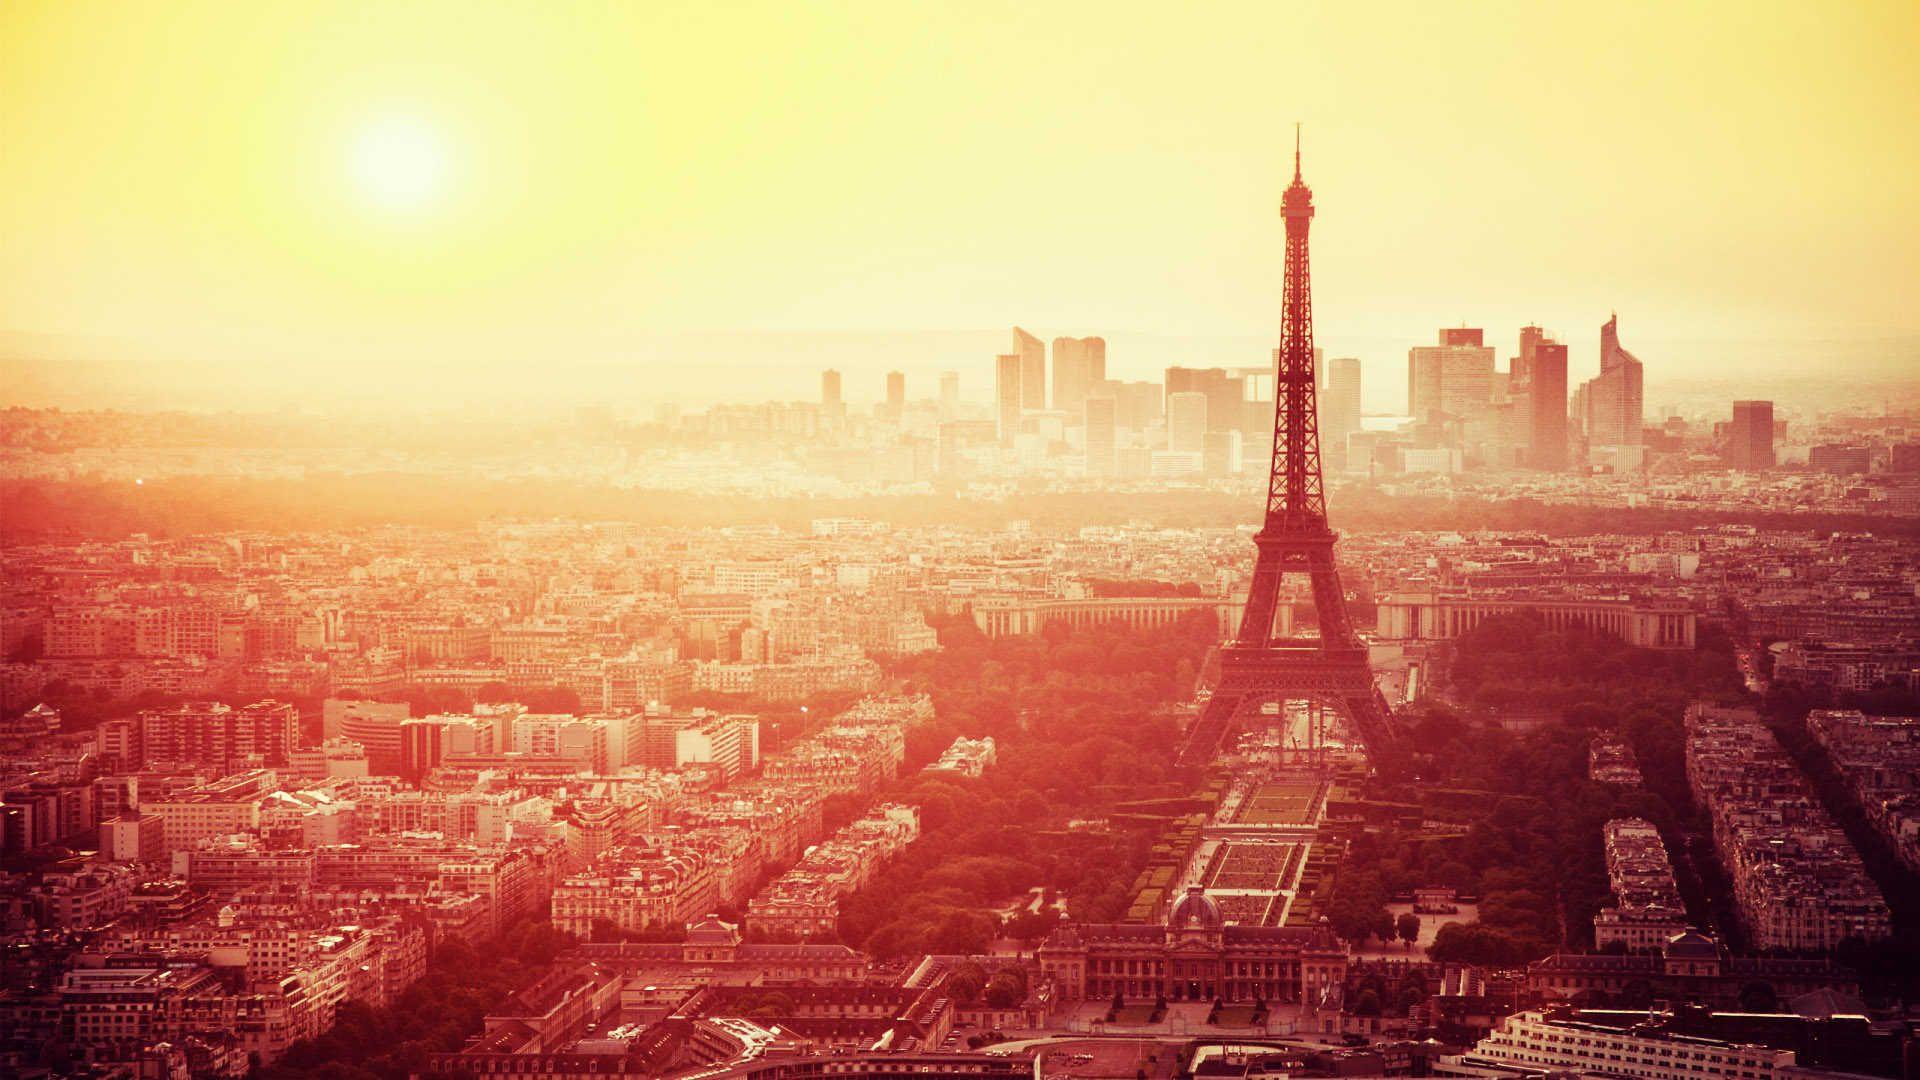 Must see Wallpaper High Quality Paris - 81f164886567115ac9c909e3a5a84d95  Image_521171.jpg